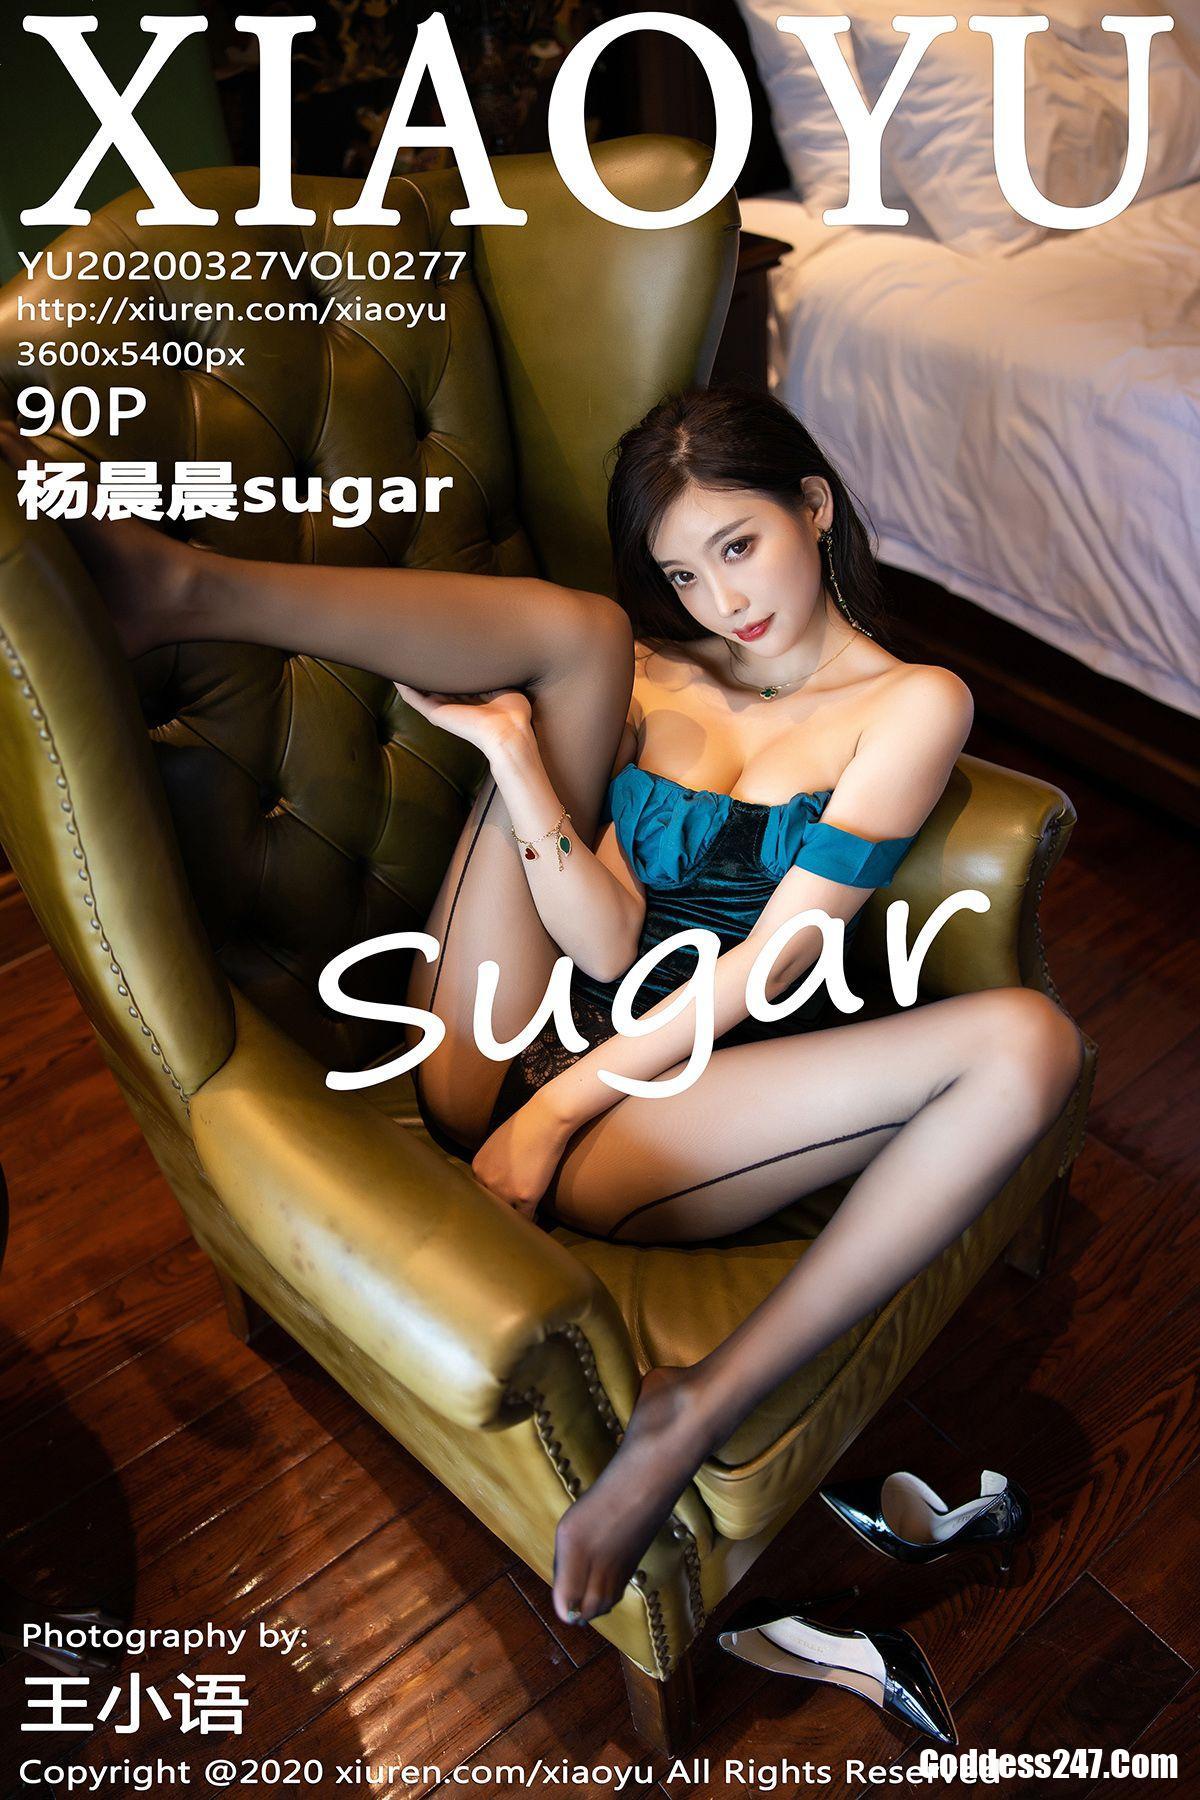 XiaoYu Vol.277 杨晨晨sugar